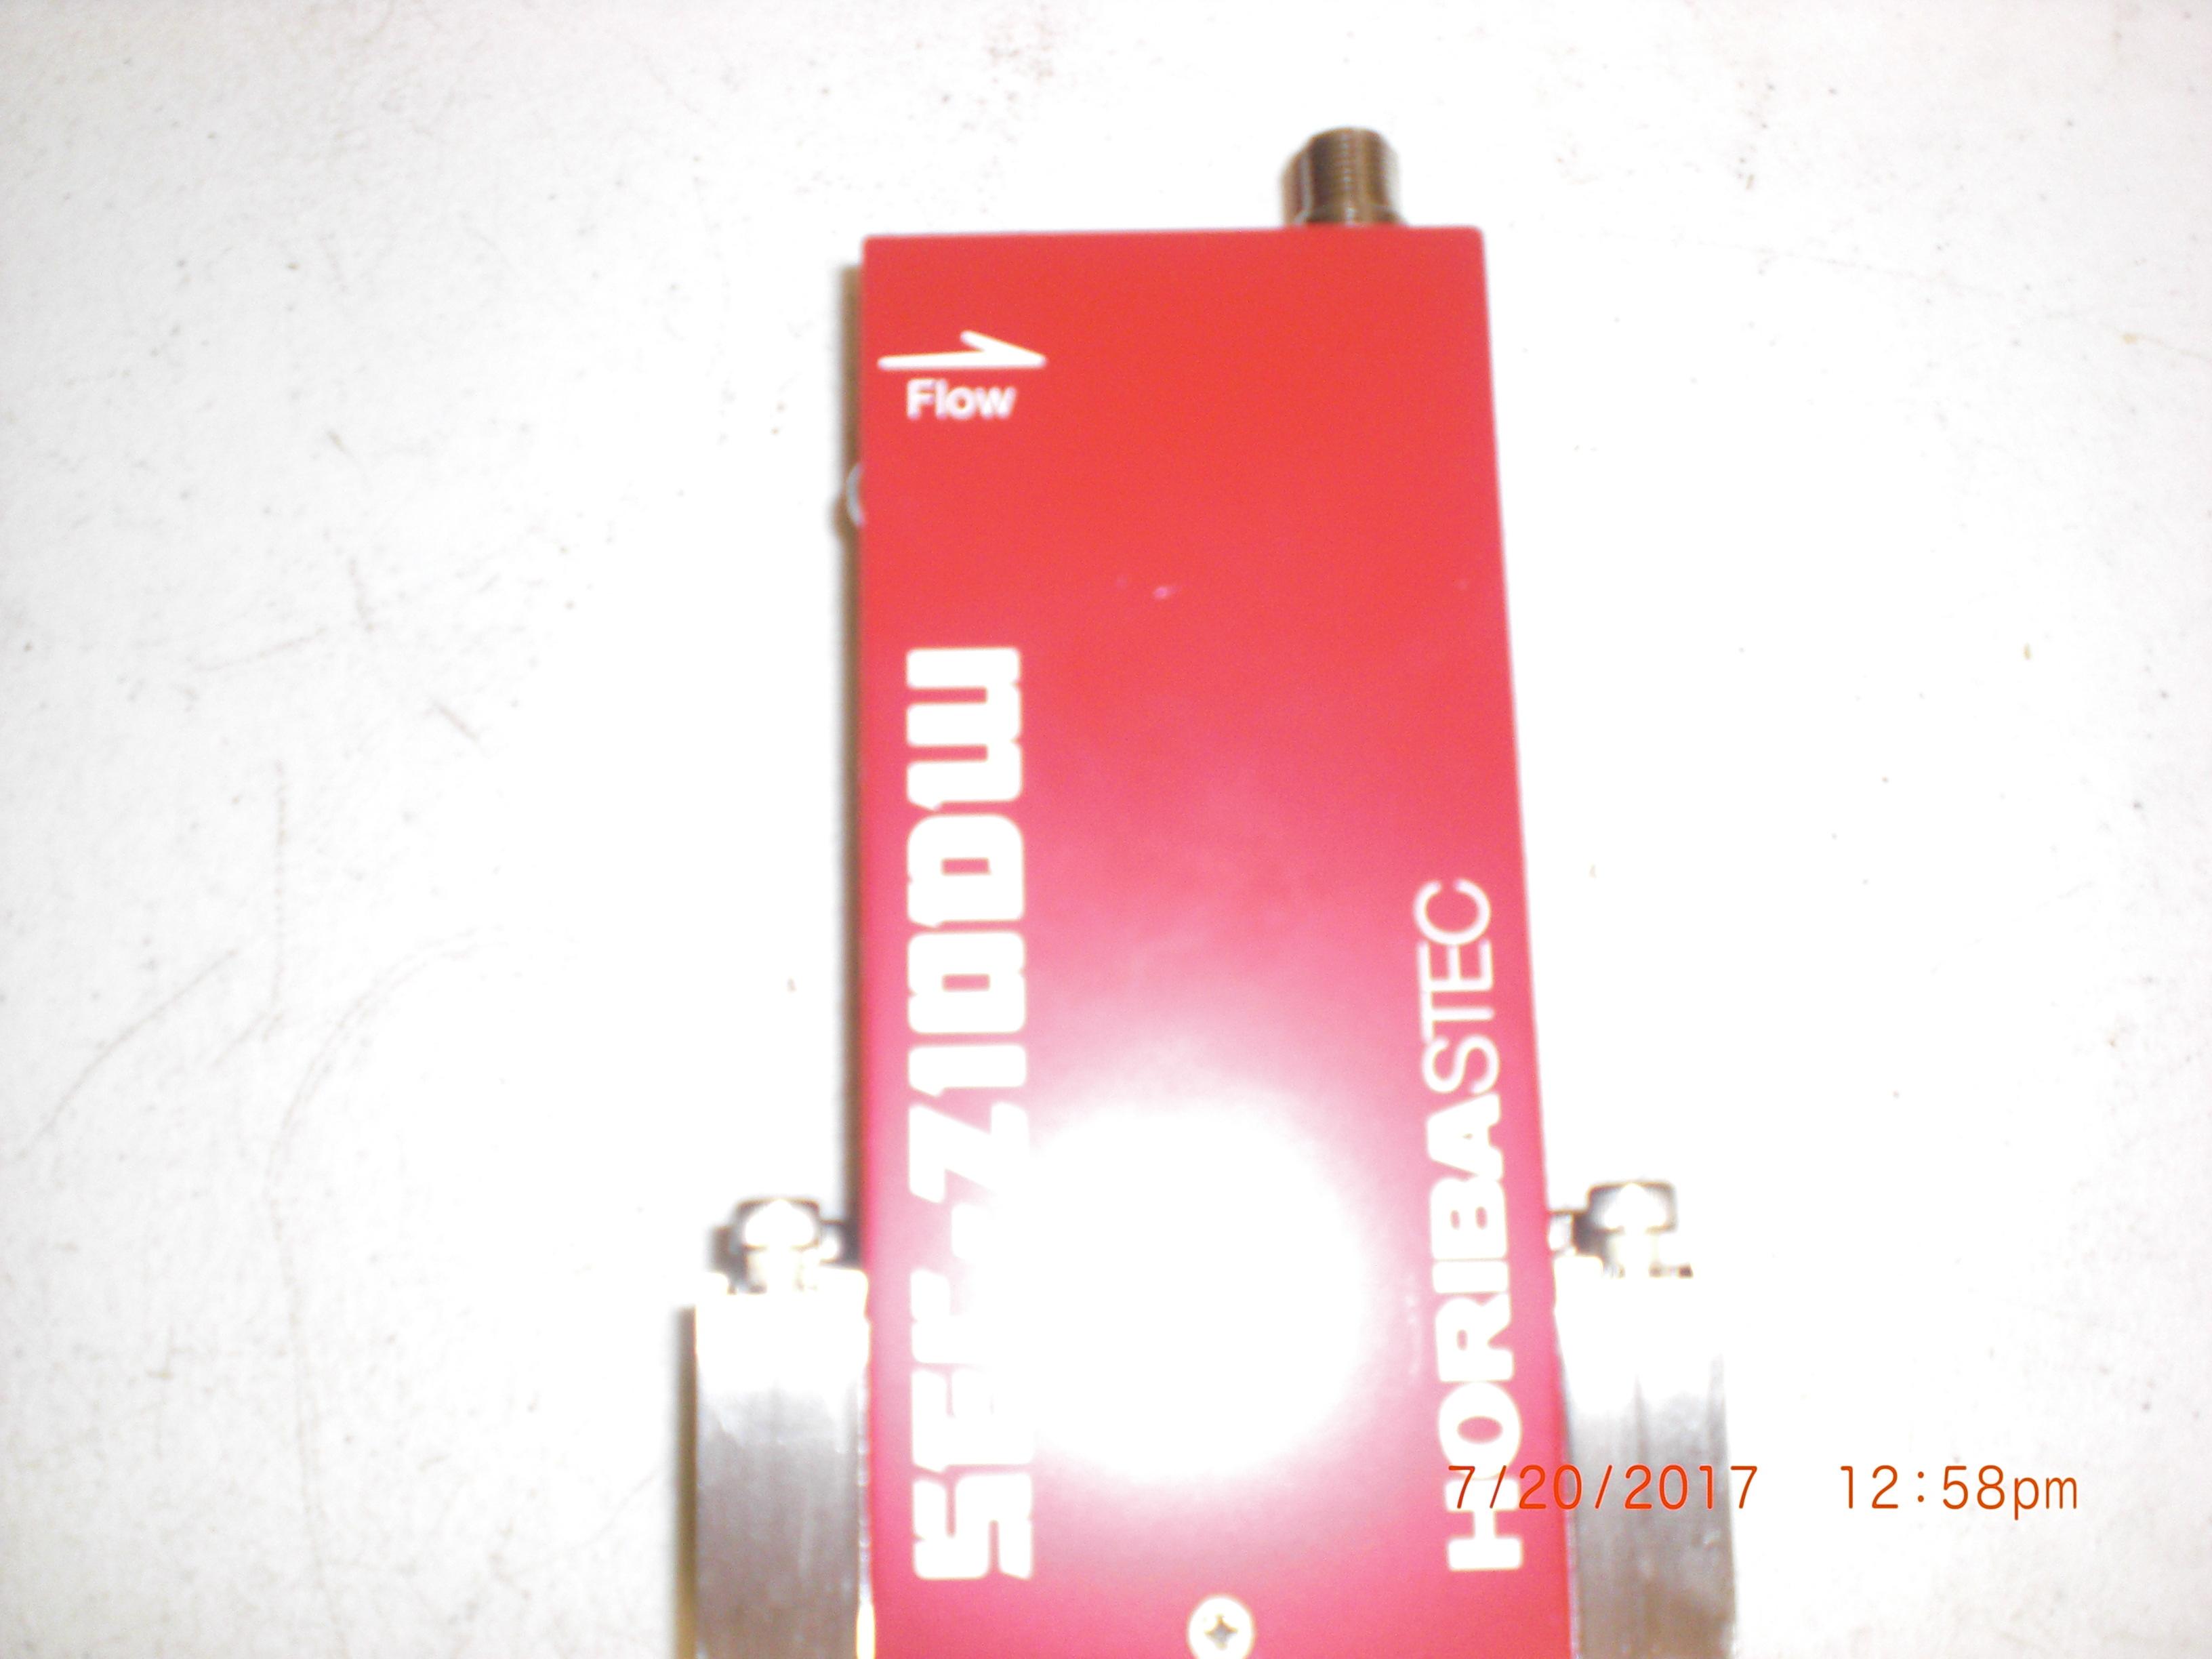 MFC HOREBIA / STEC SEC-Z12DWM-Ar2-30SLM Harvested never installed System